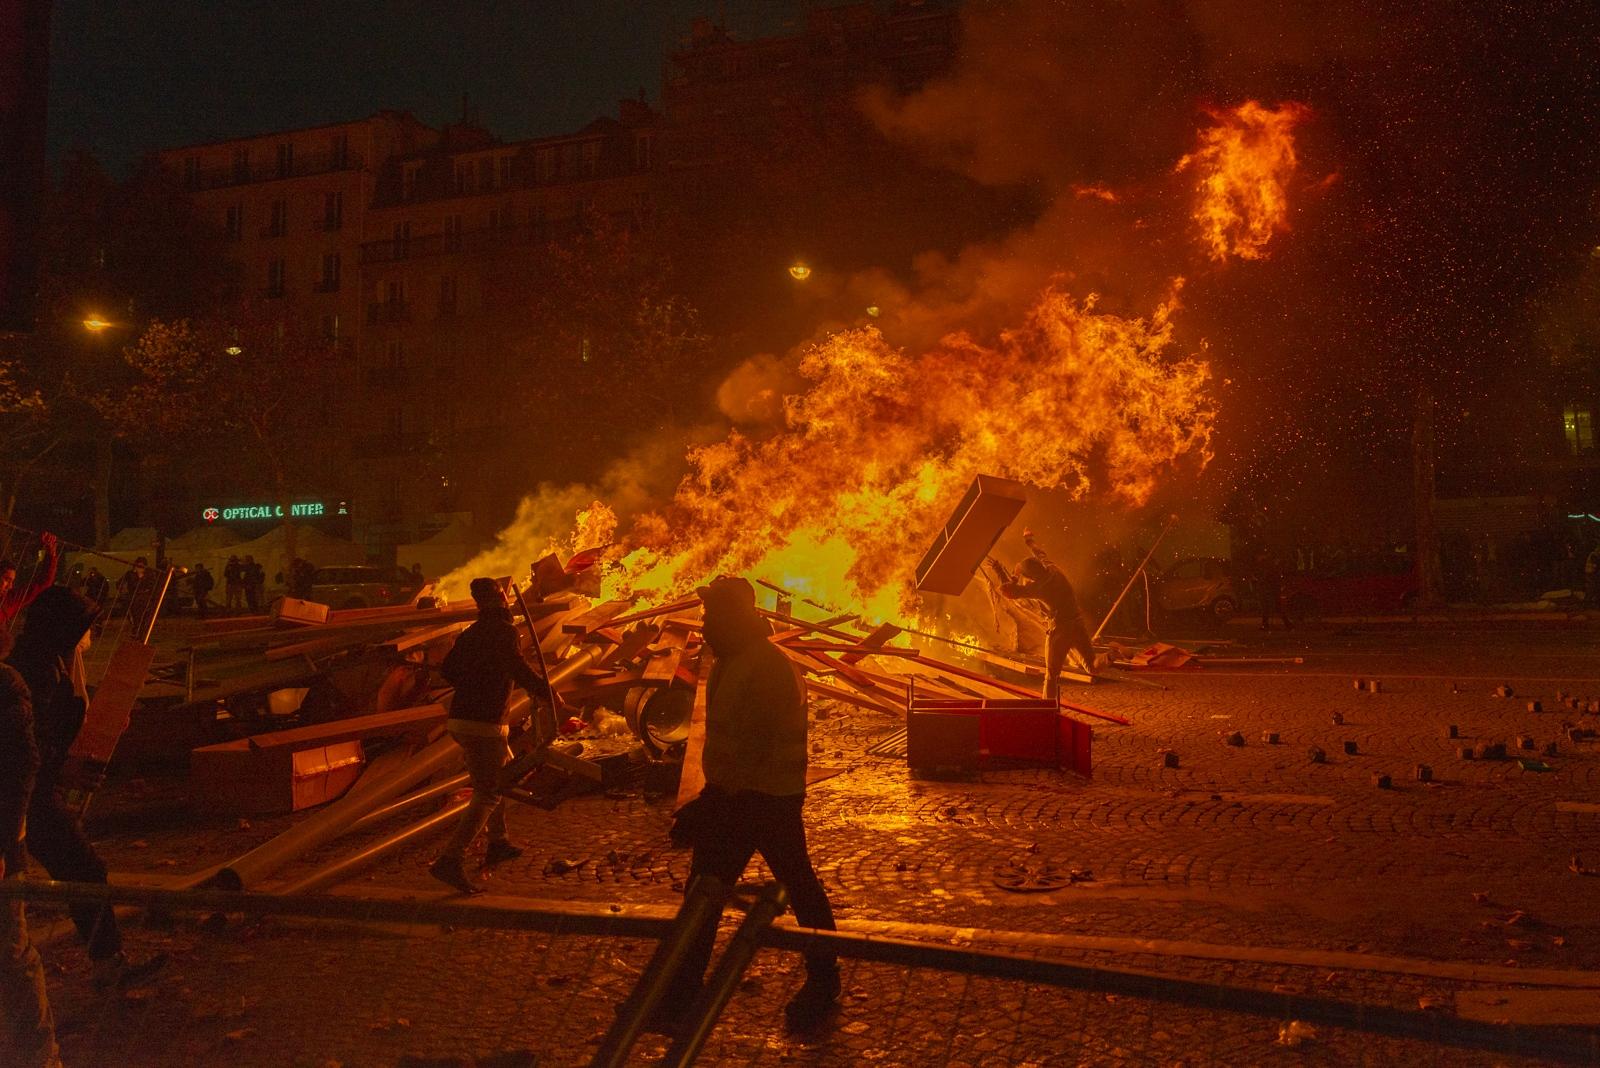 Un feu de barricade dans une avenue huppée de la Capitale Paris - Acte II - Avenue de la Grande Armée le 24 novembre 2018